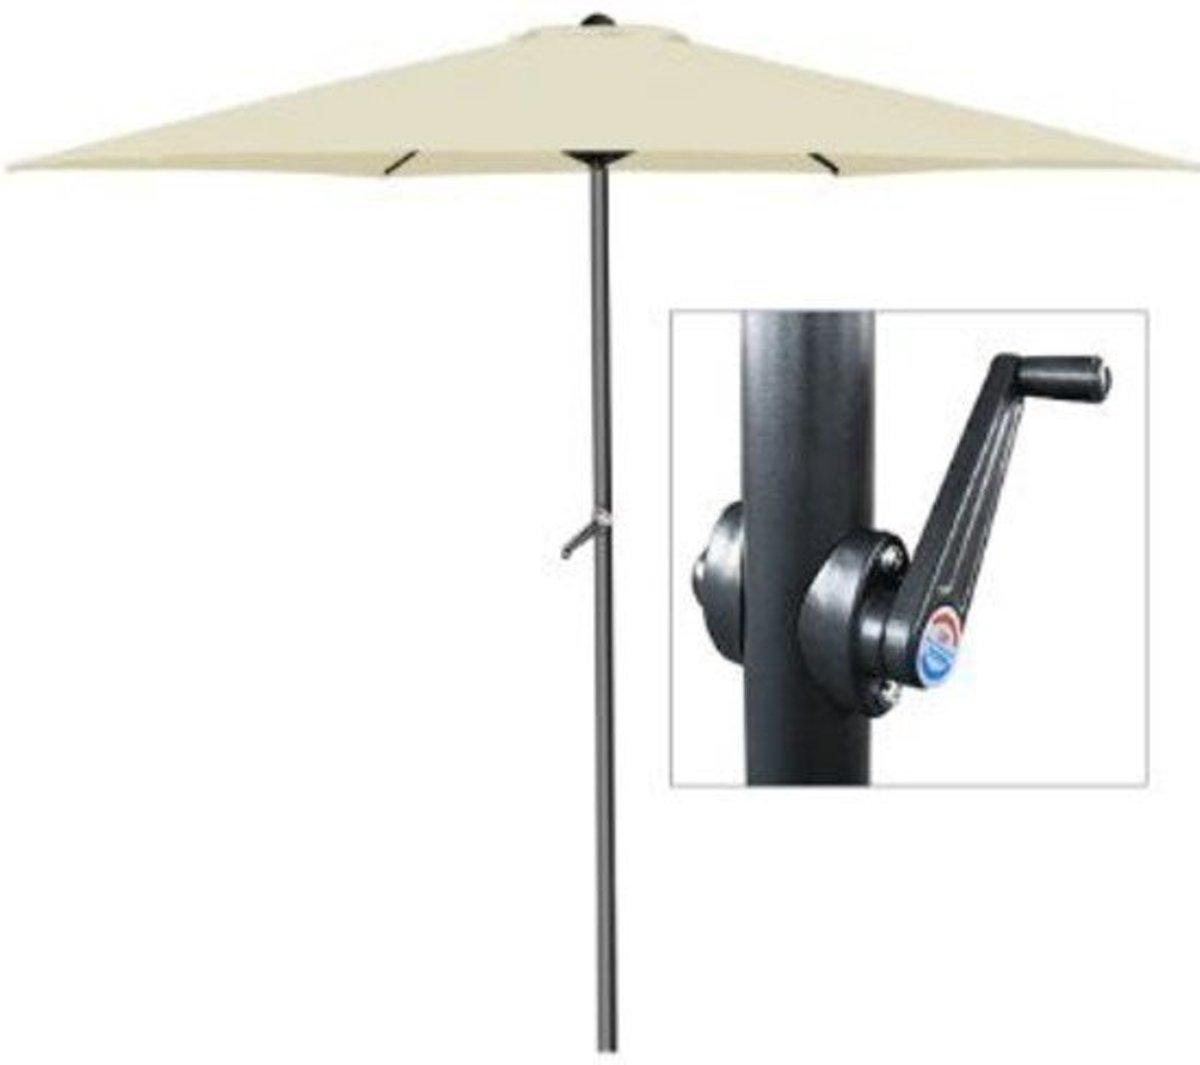 parasol kopen online fabulous pro garden parasol rond. Black Bedroom Furniture Sets. Home Design Ideas